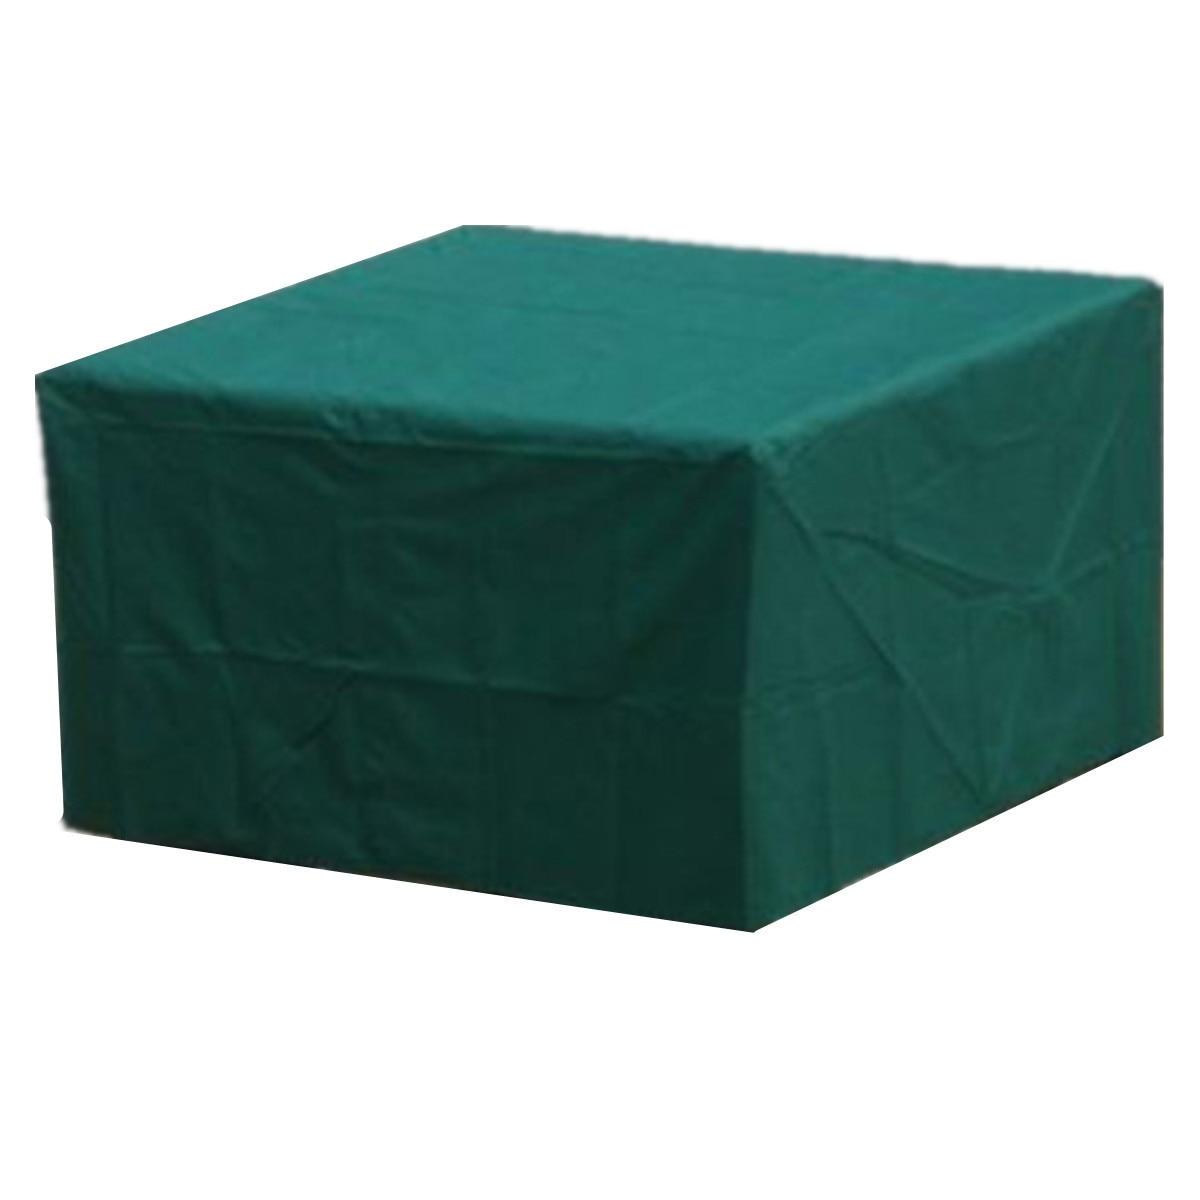 Crate and barrel outdoor furniture sale - Patio Furniture Covers Sectional Jallen Net Garden Patio Furniture Cover Modern Patio U0026amp Outdoor Crate And Barrel Outdoor Furniture Covers